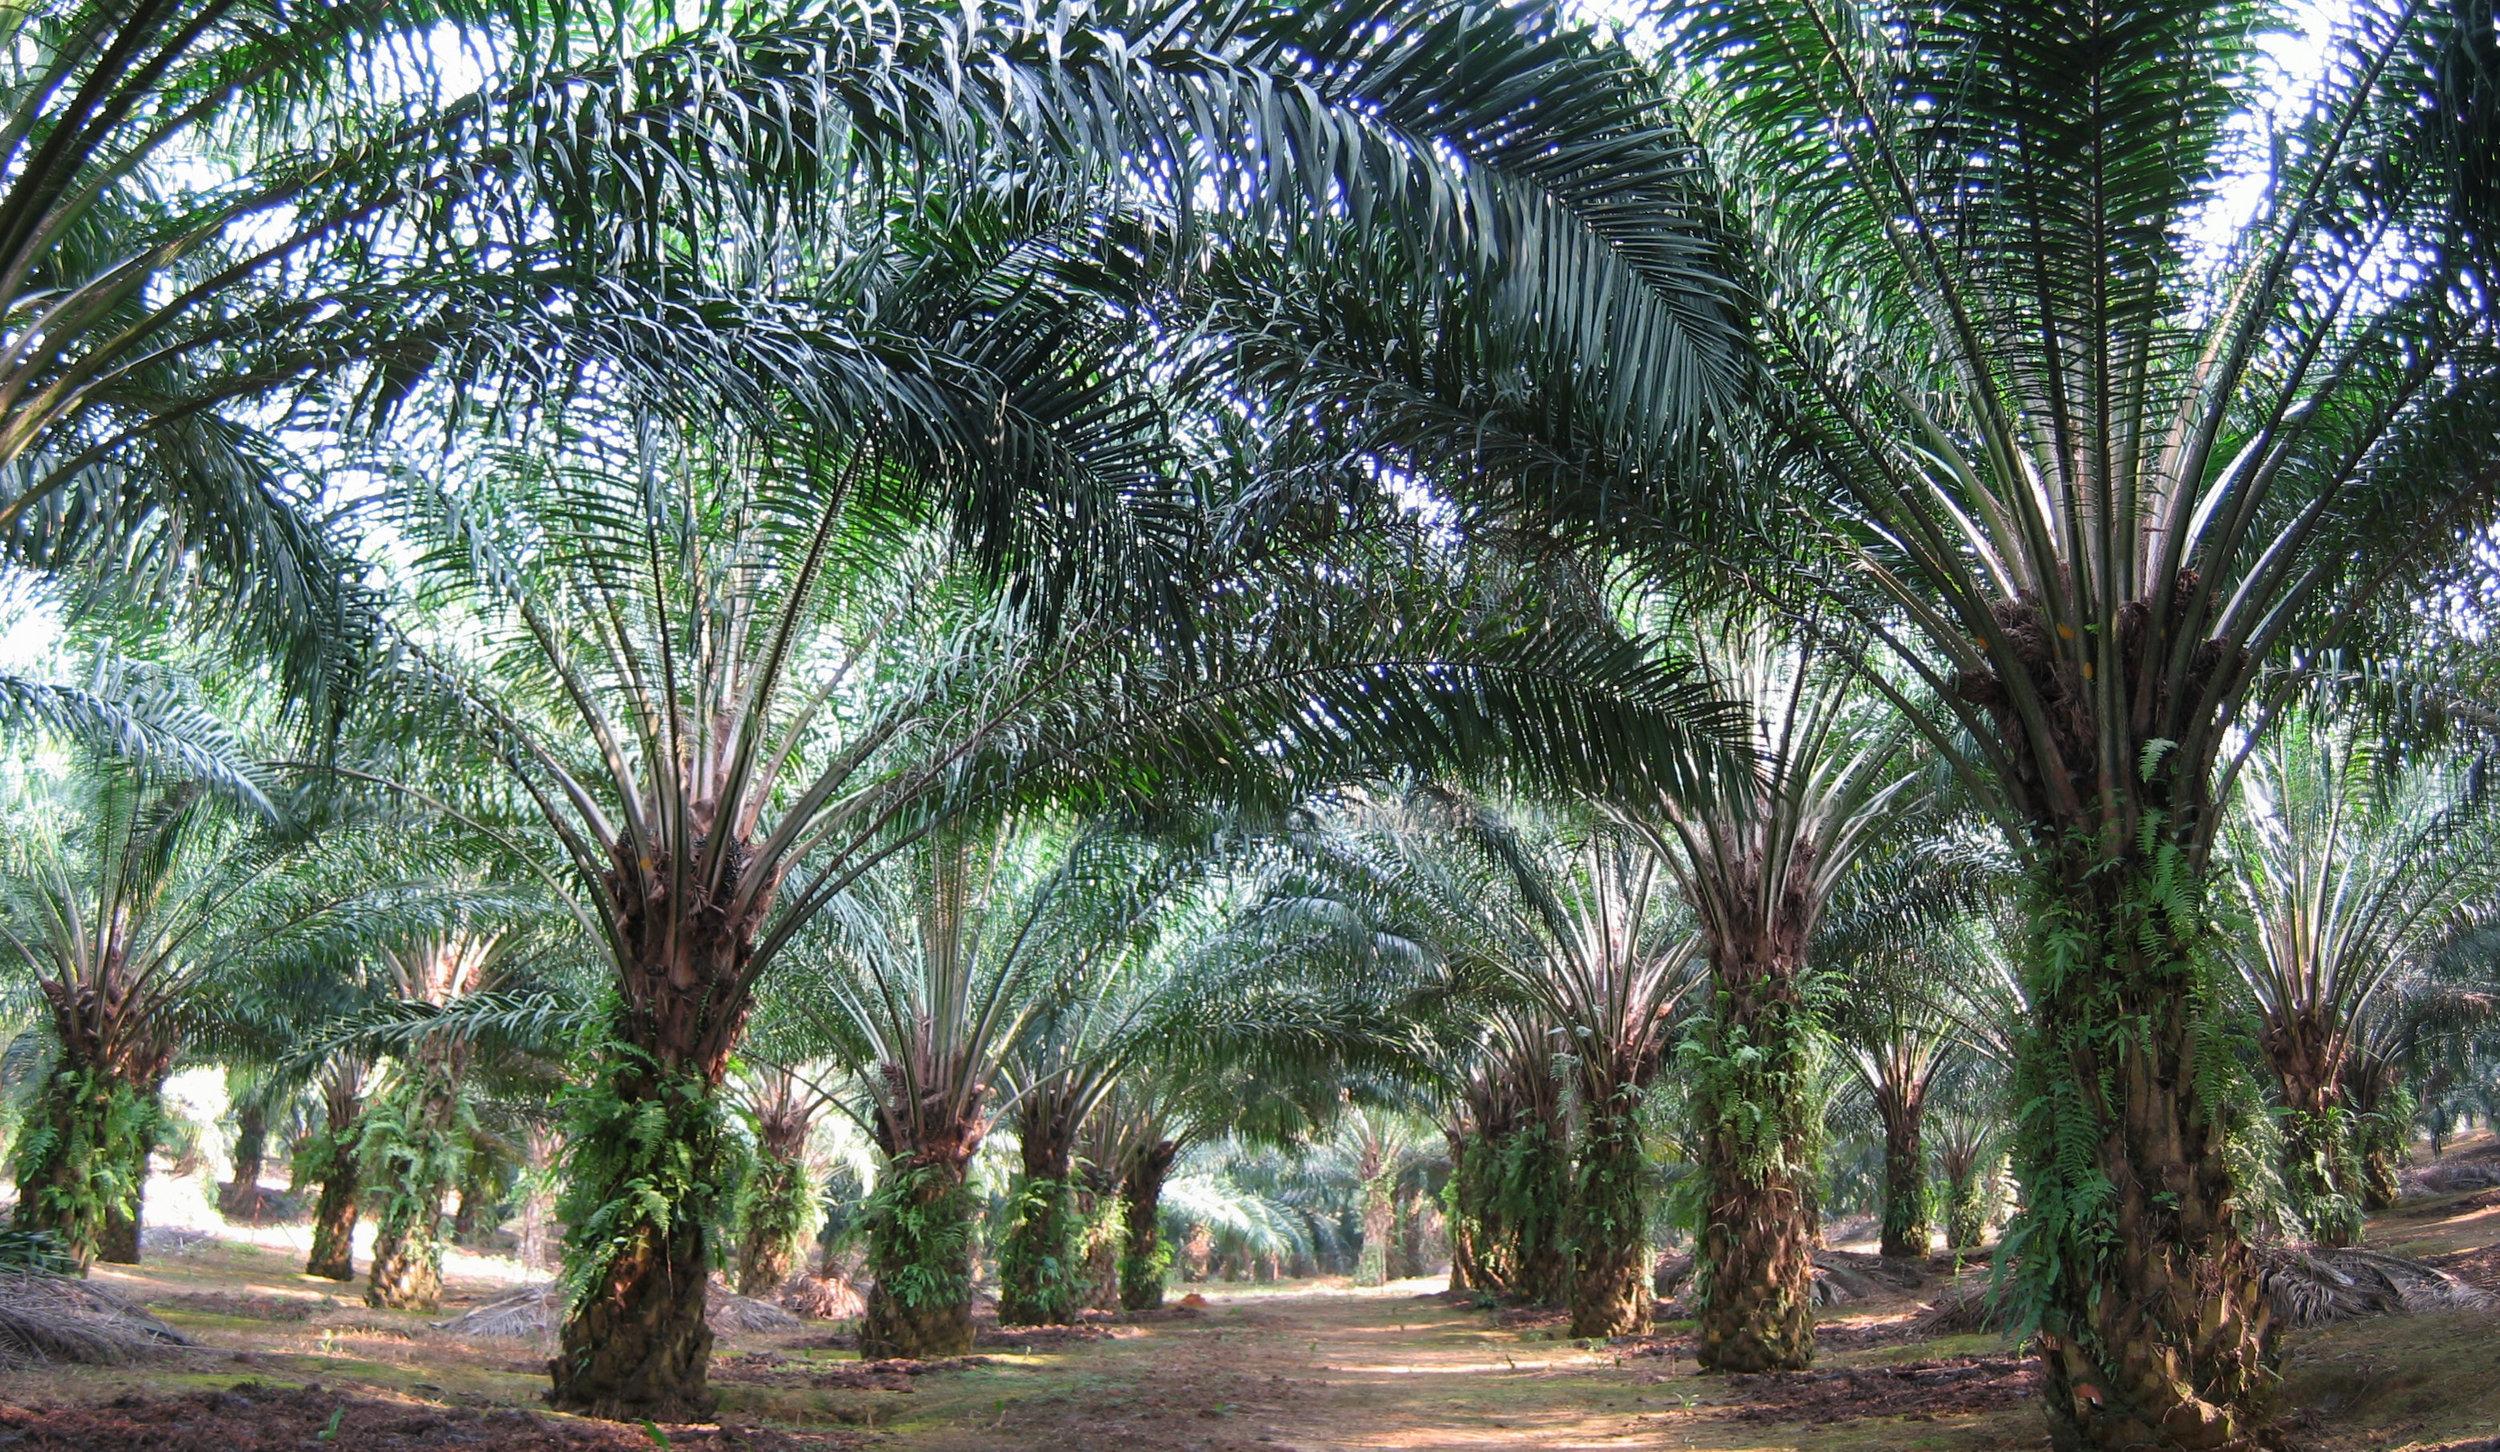 An oil palm plantation in Sabah province, Borneo.